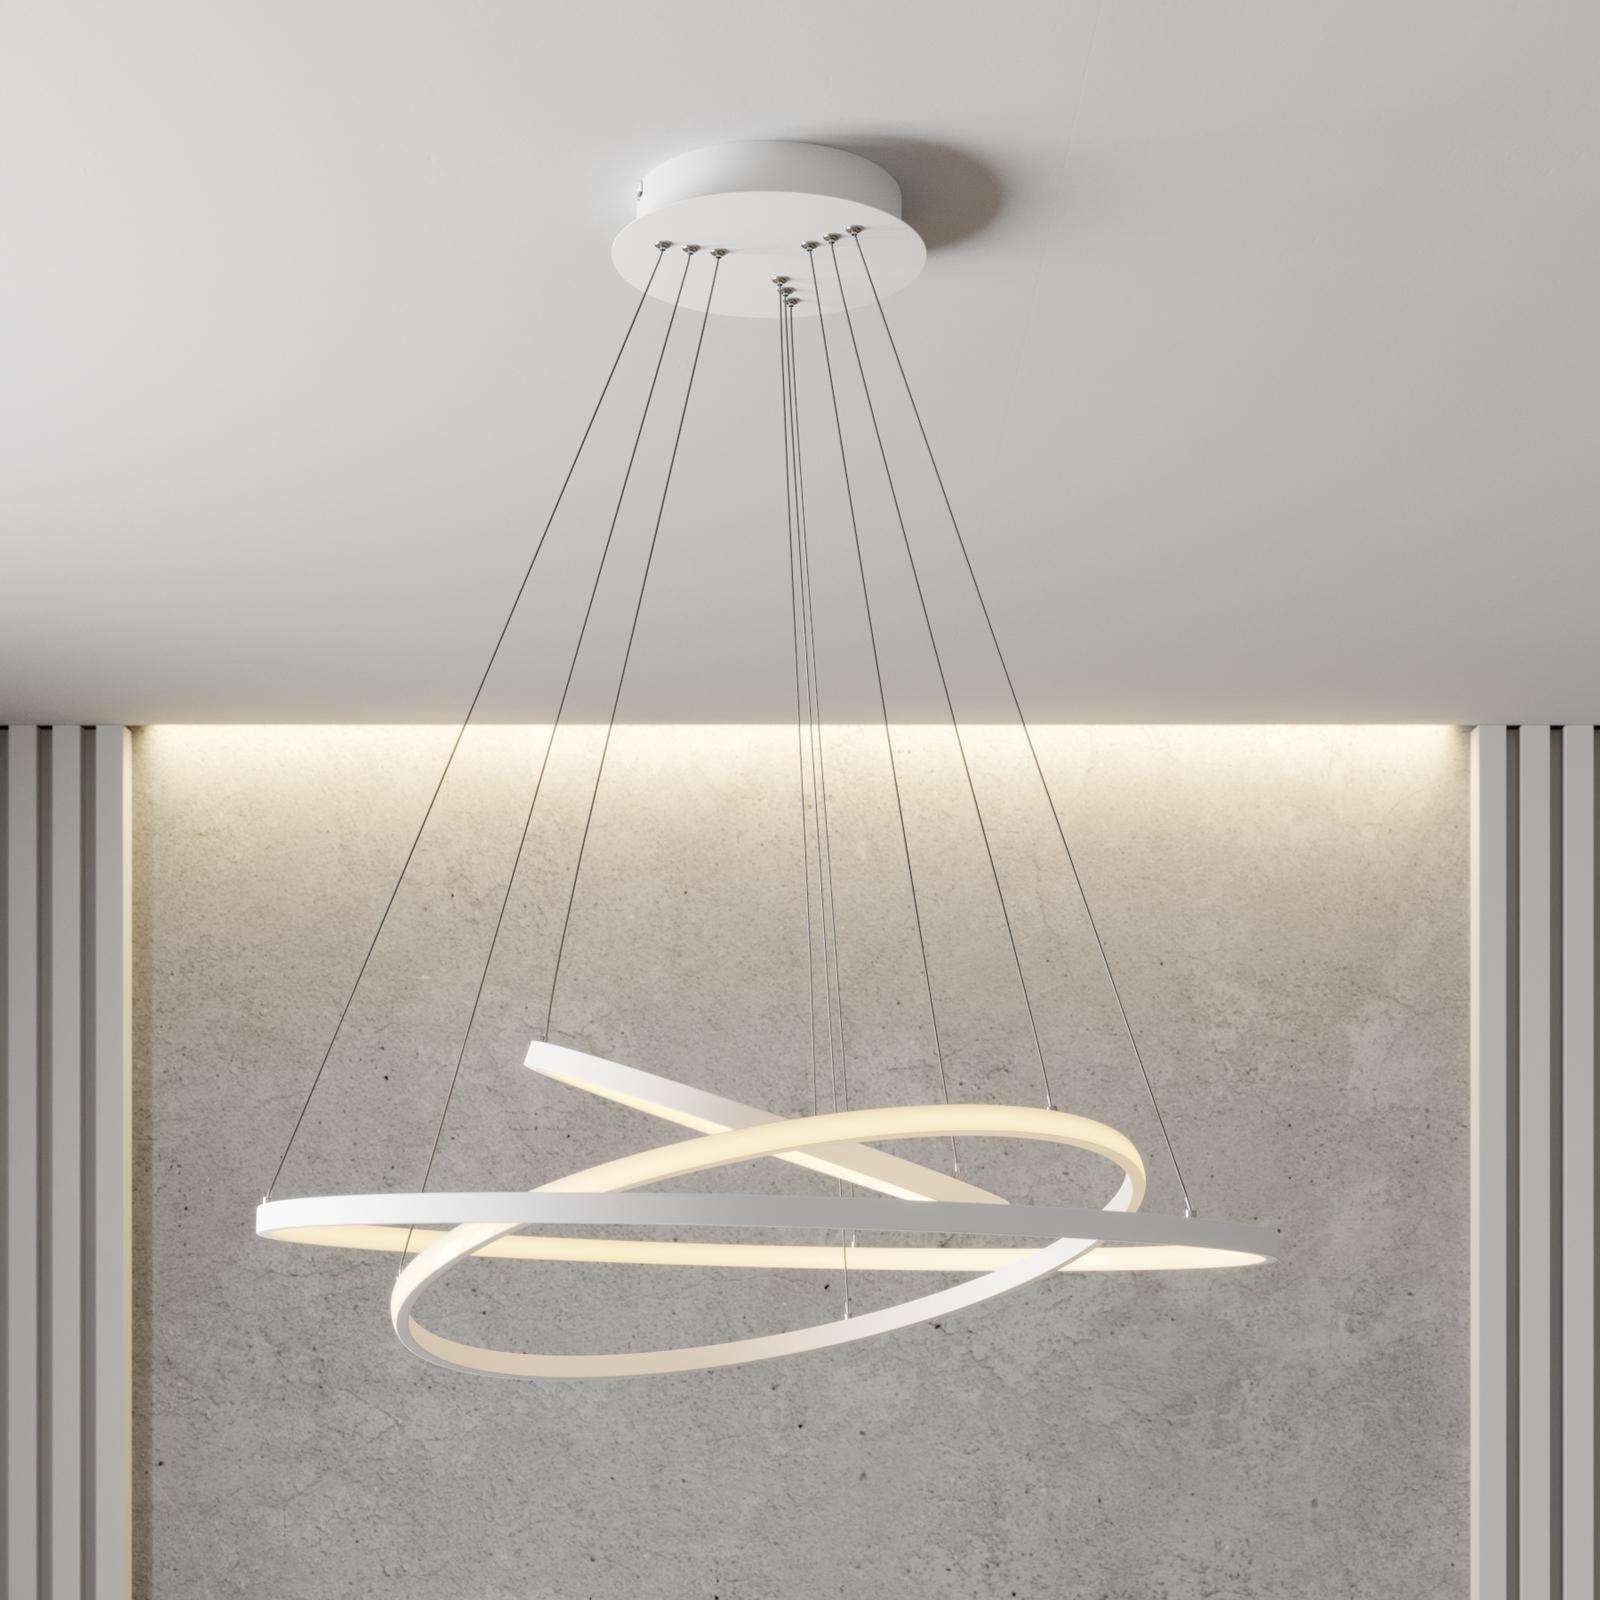 Lámpara colgante LED Ezana tres anillos, blanco